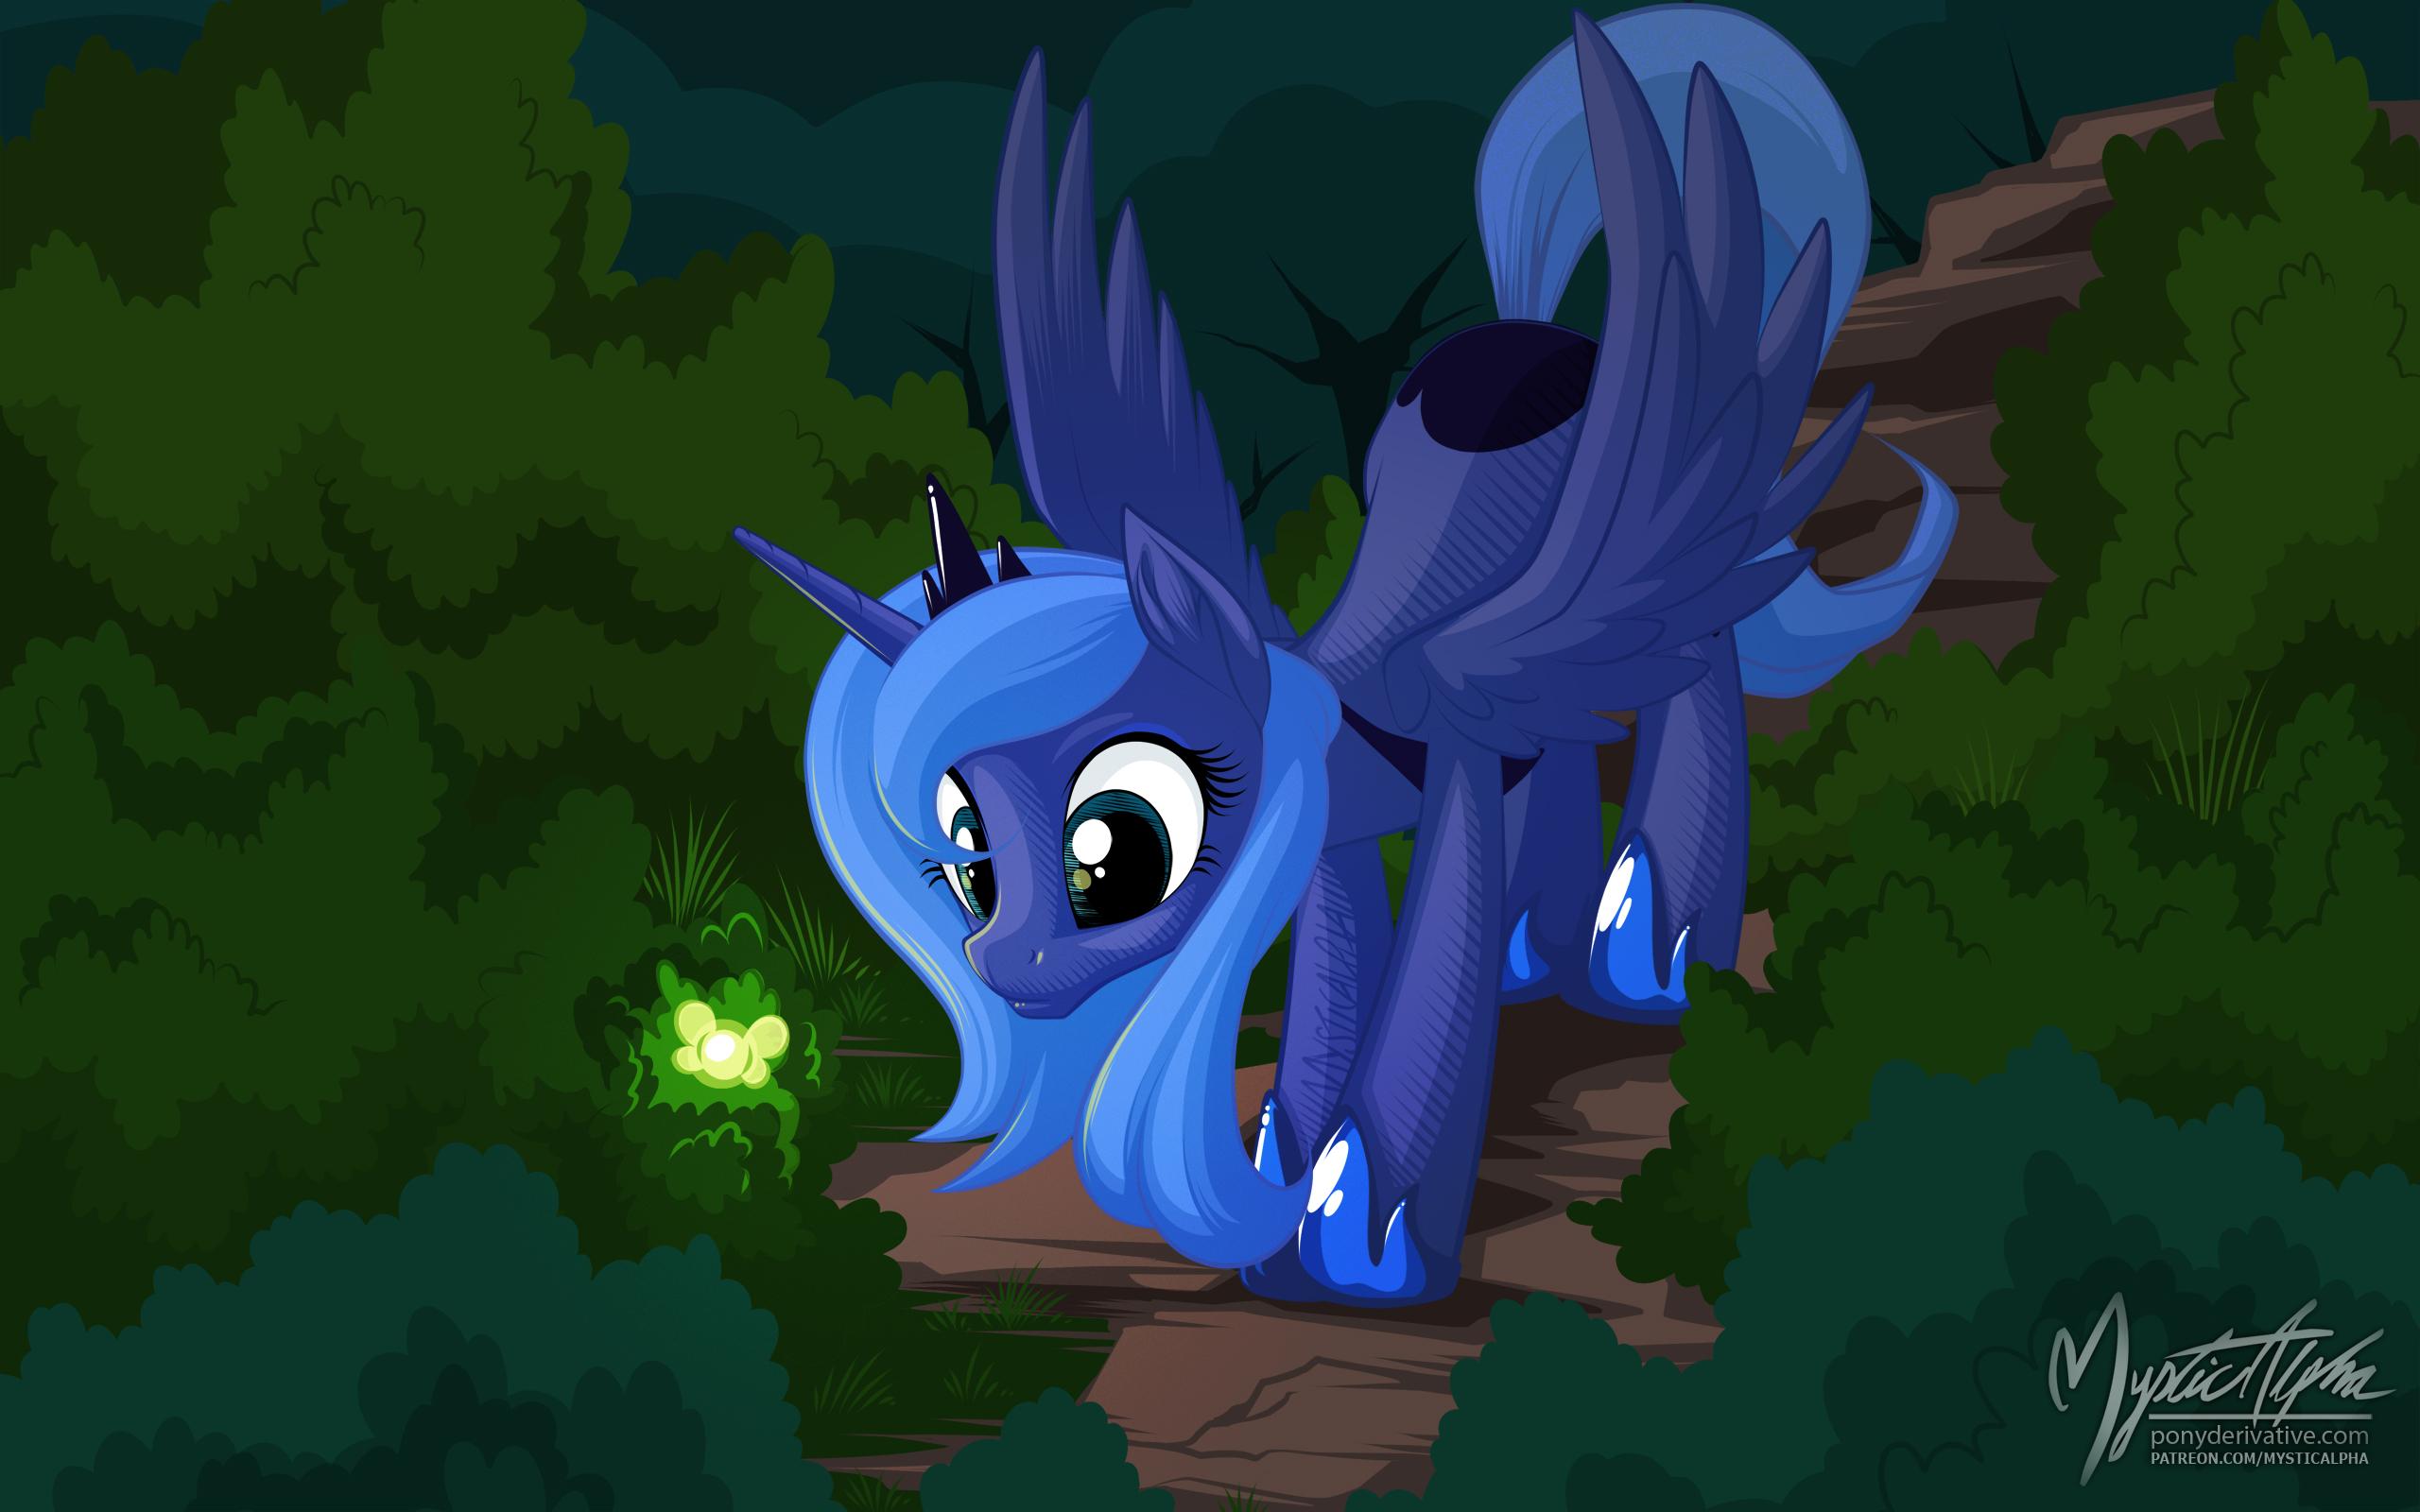 luna of the night